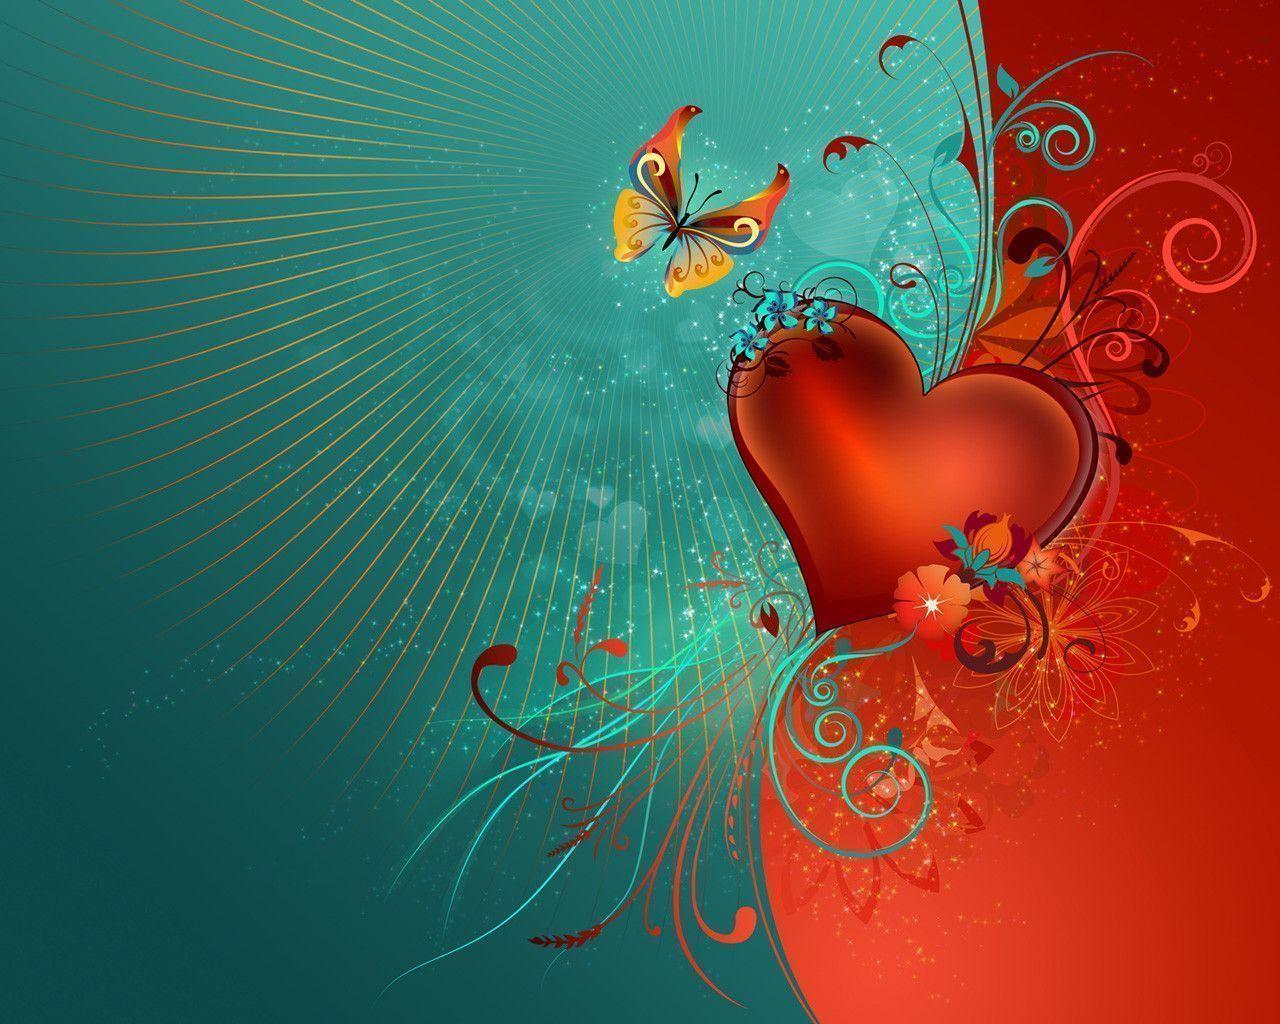 Heart wallpaper - Beautiful Pictures Wallpaper (31395907) - Fanpop